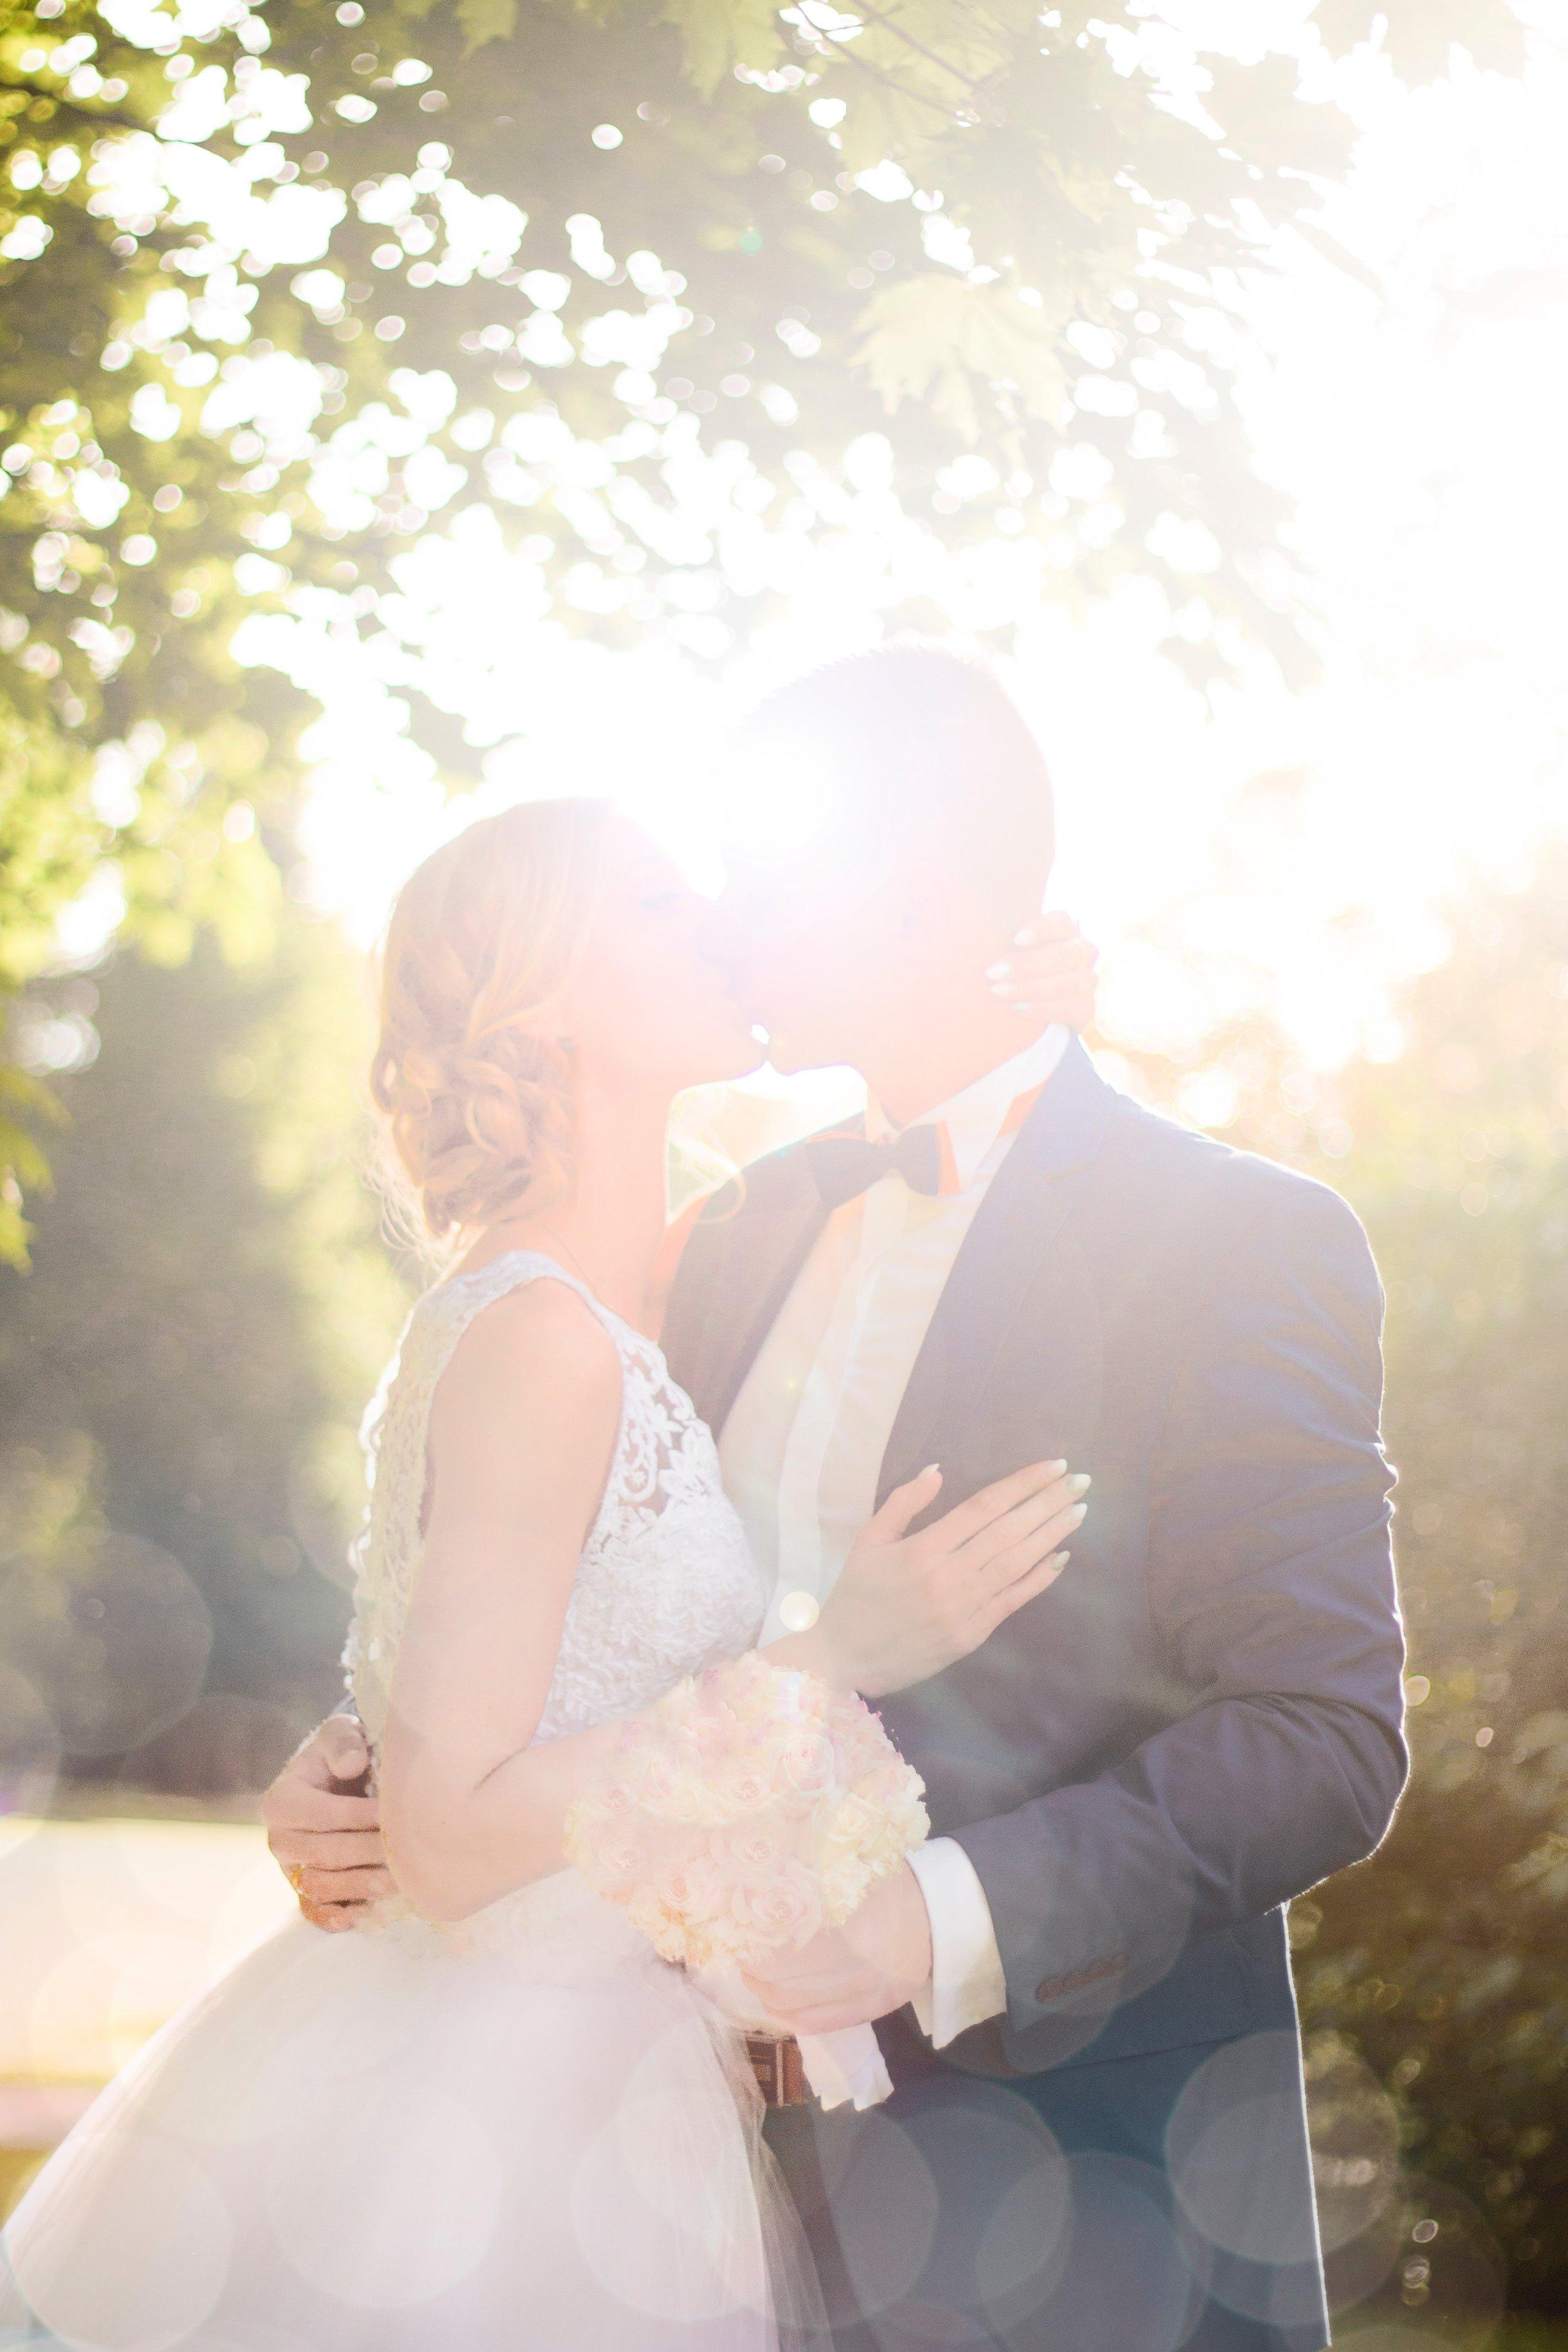 bridal-bride-celebration-1244700.jpg